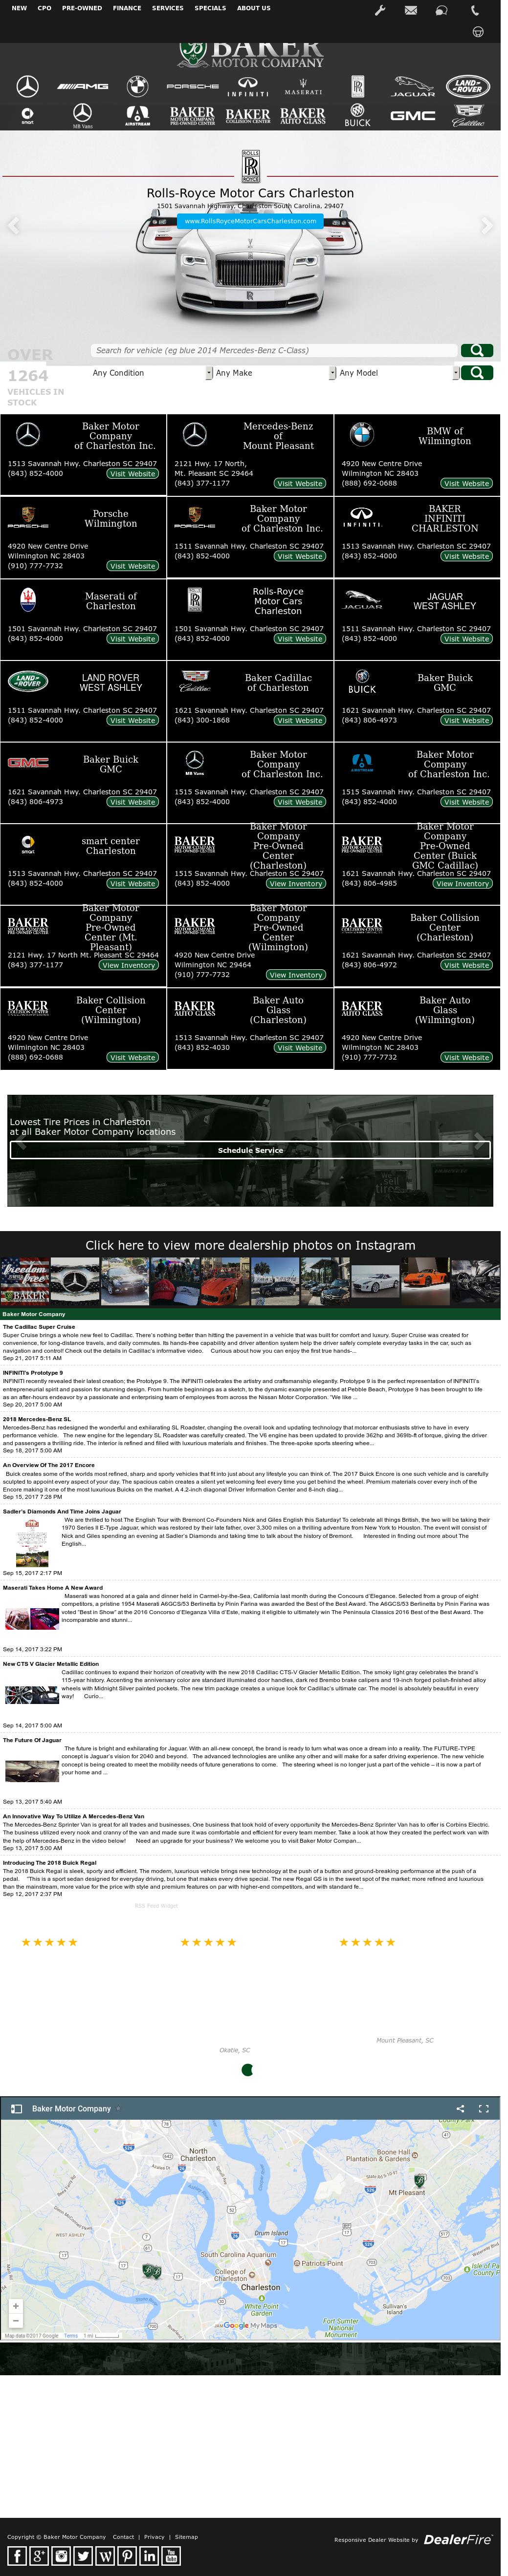 Baker Motor pany petitors Revenue and Employees Owler